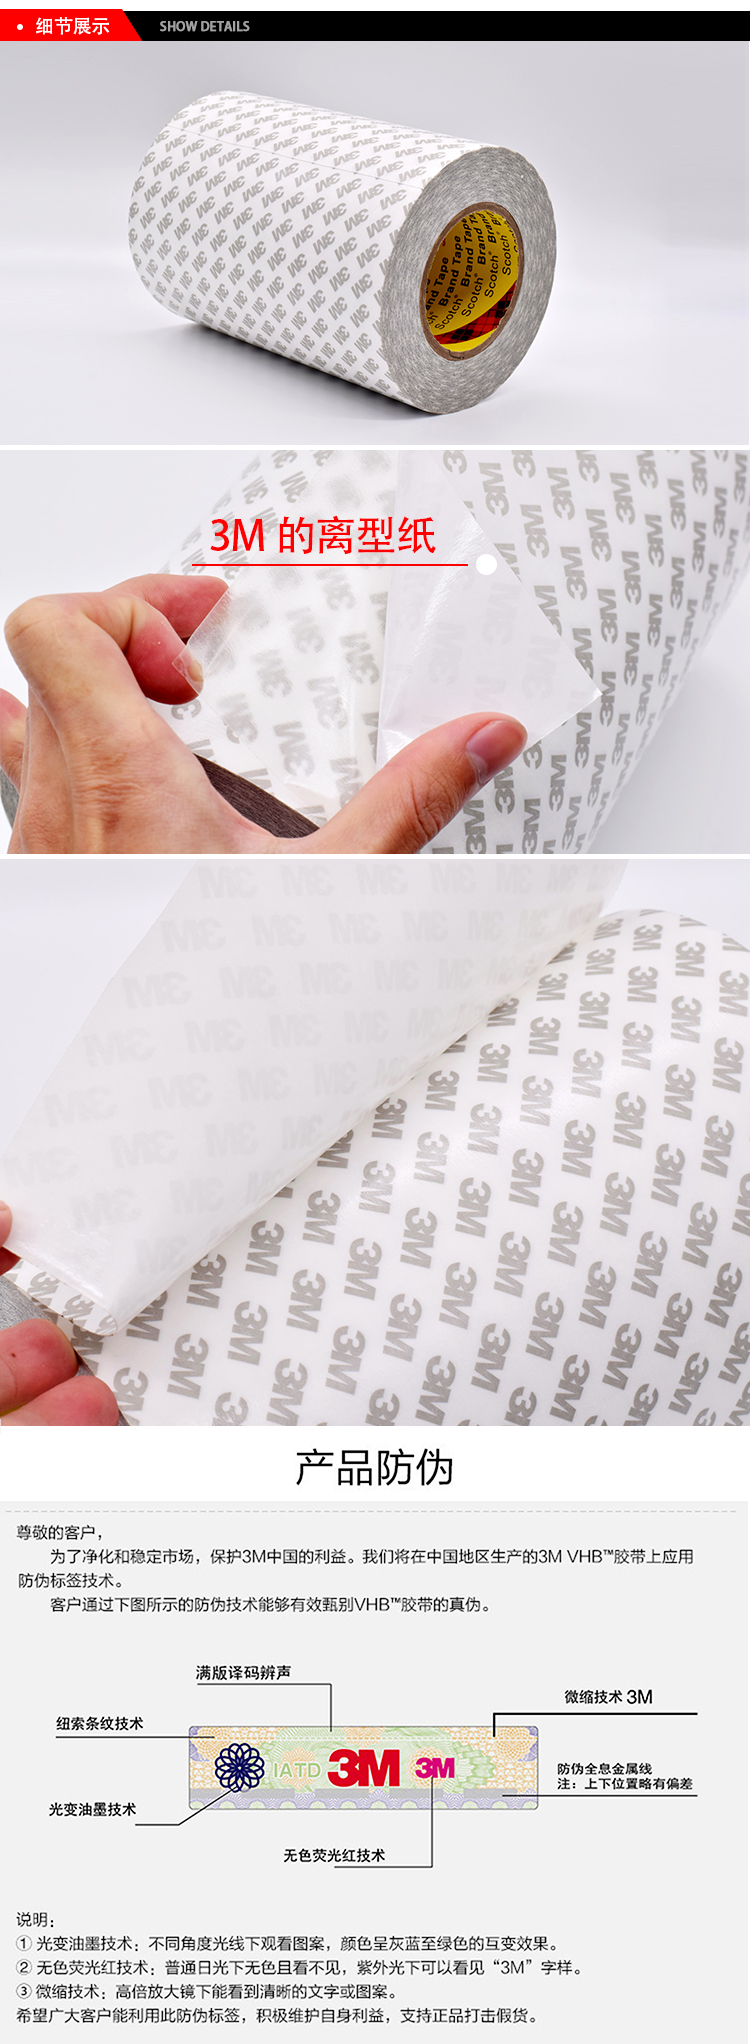 3M胶带 GTM系列双面胶细节展示